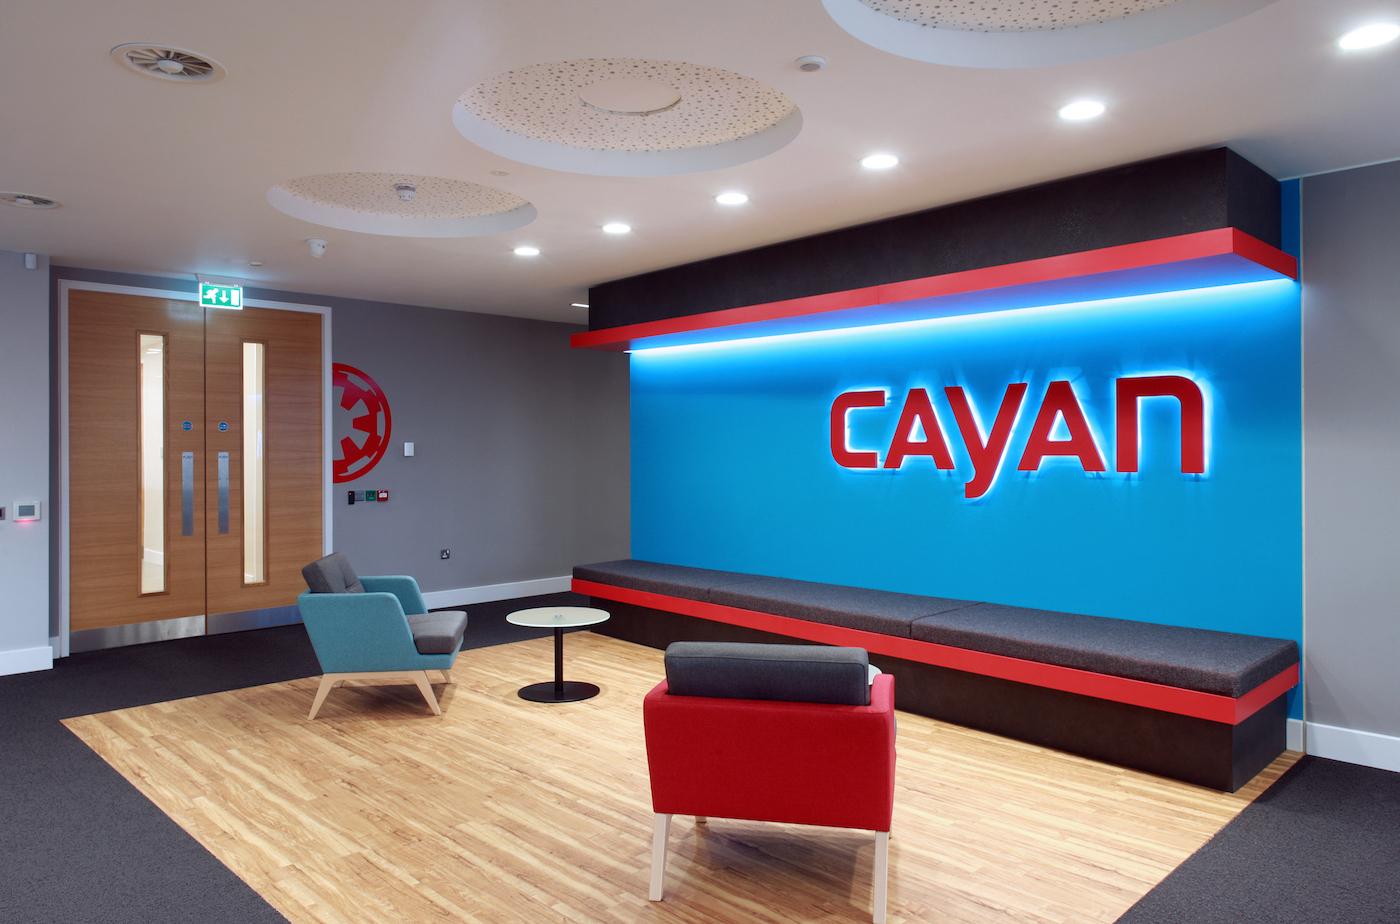 Cayan Office Renovation headline image